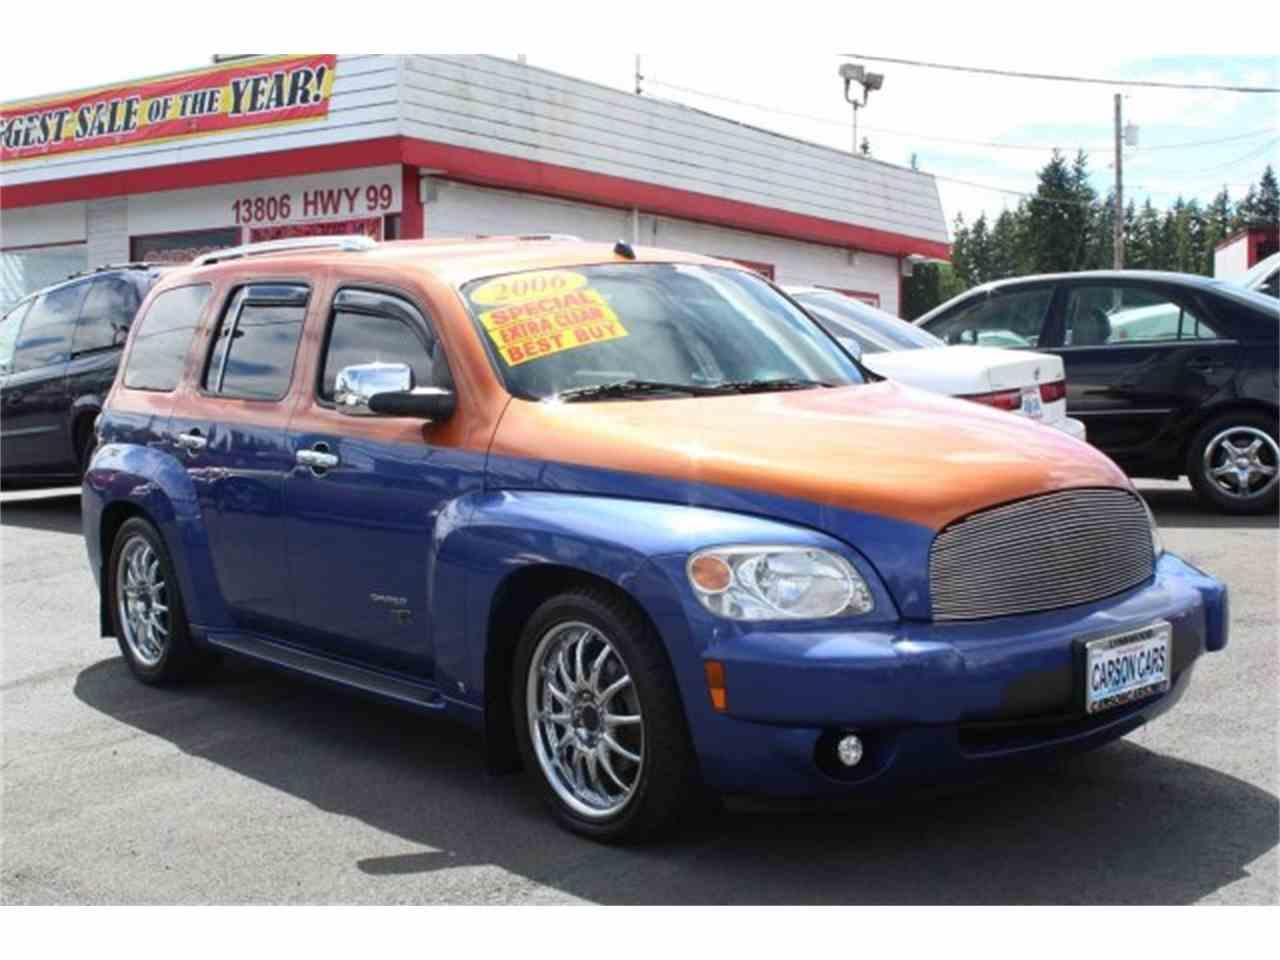 2006 Chevrolet HHR for Sale - CC-985055